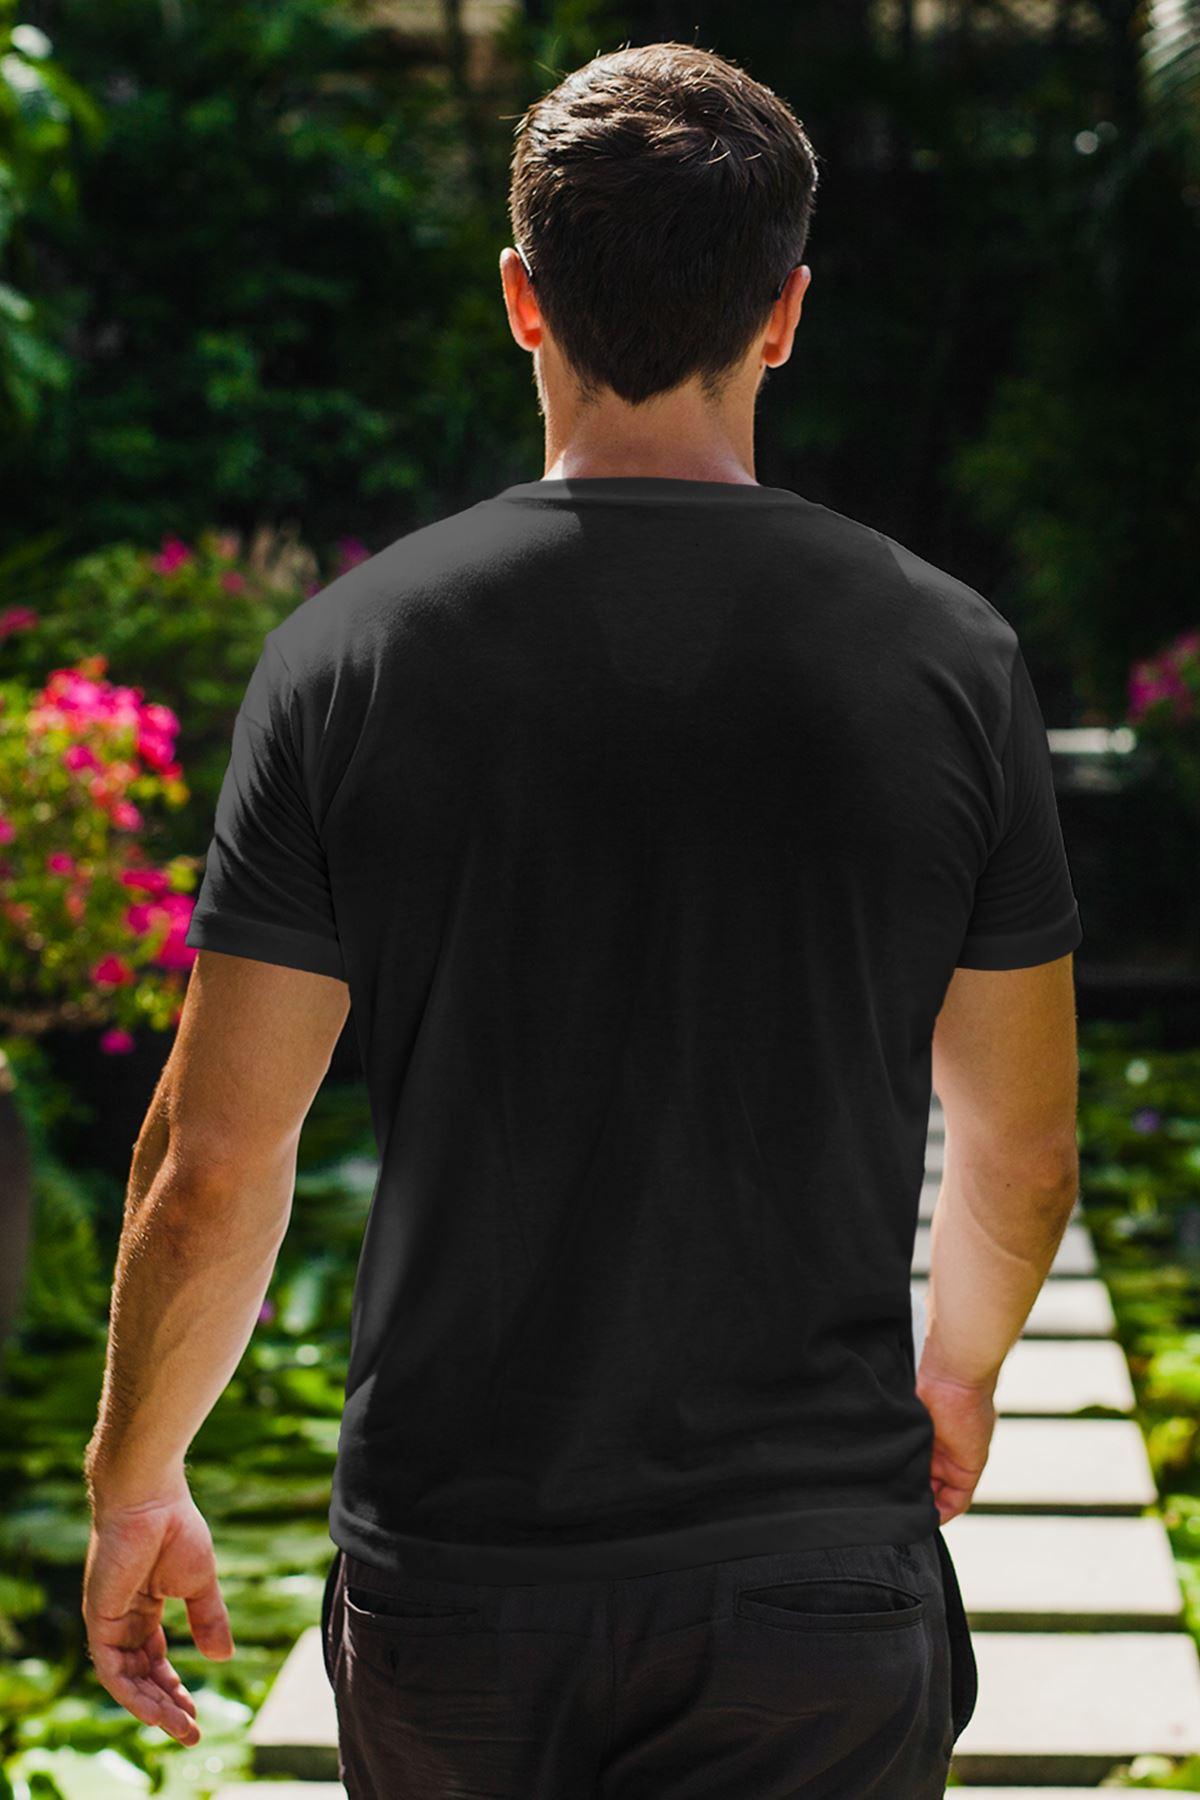 Rick Siyah Erkek Tshirt - Tişört